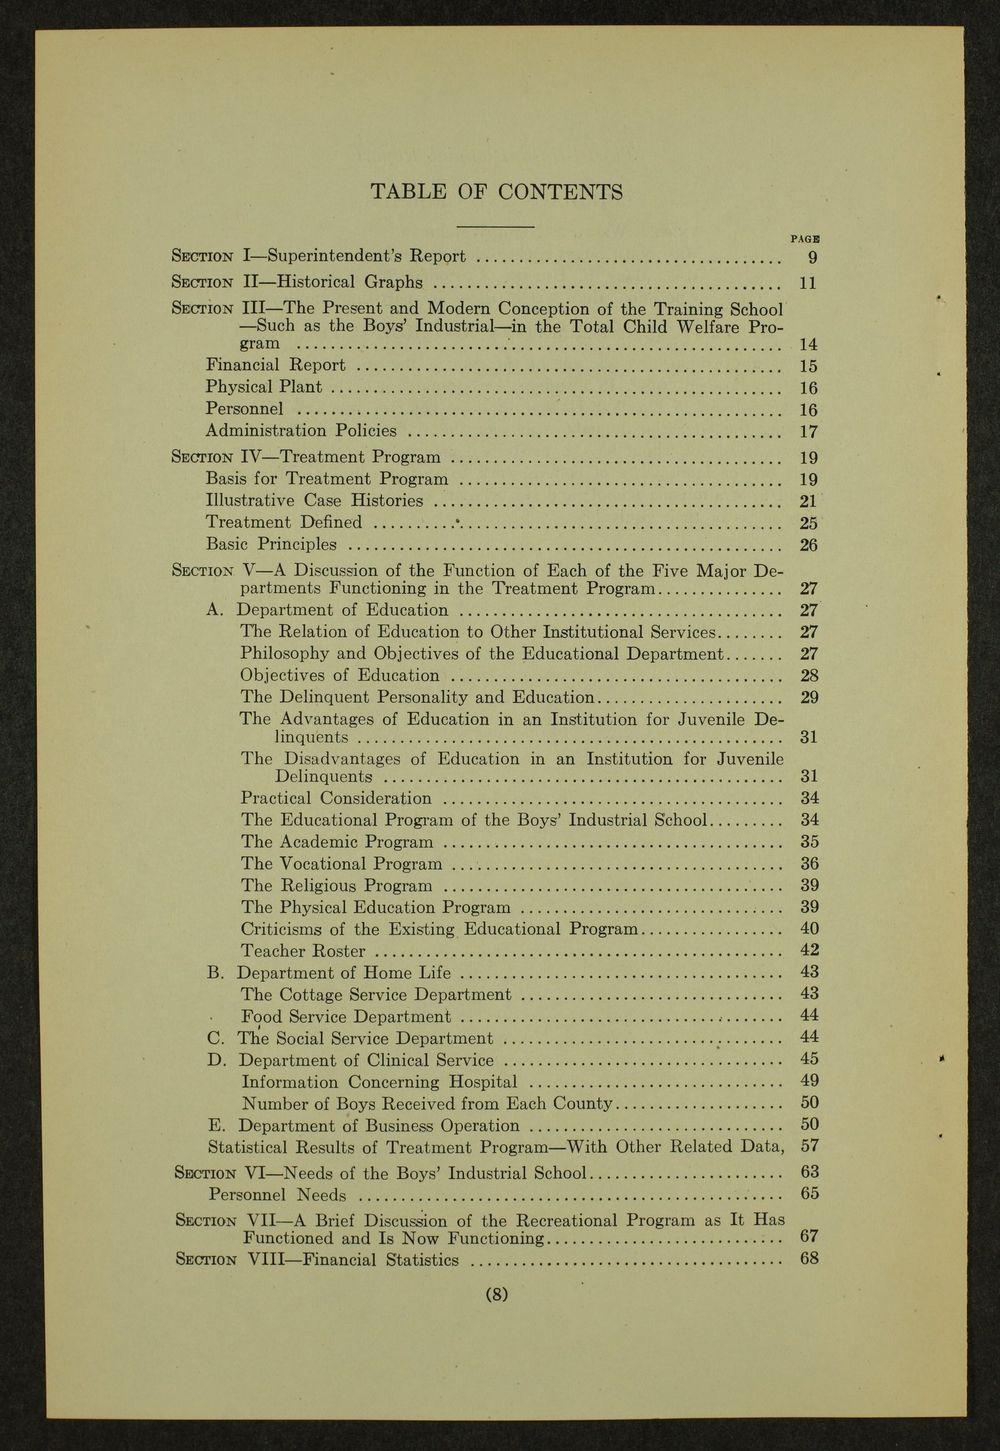 Biennial report of the Boys Industrial School, 1946 - 8